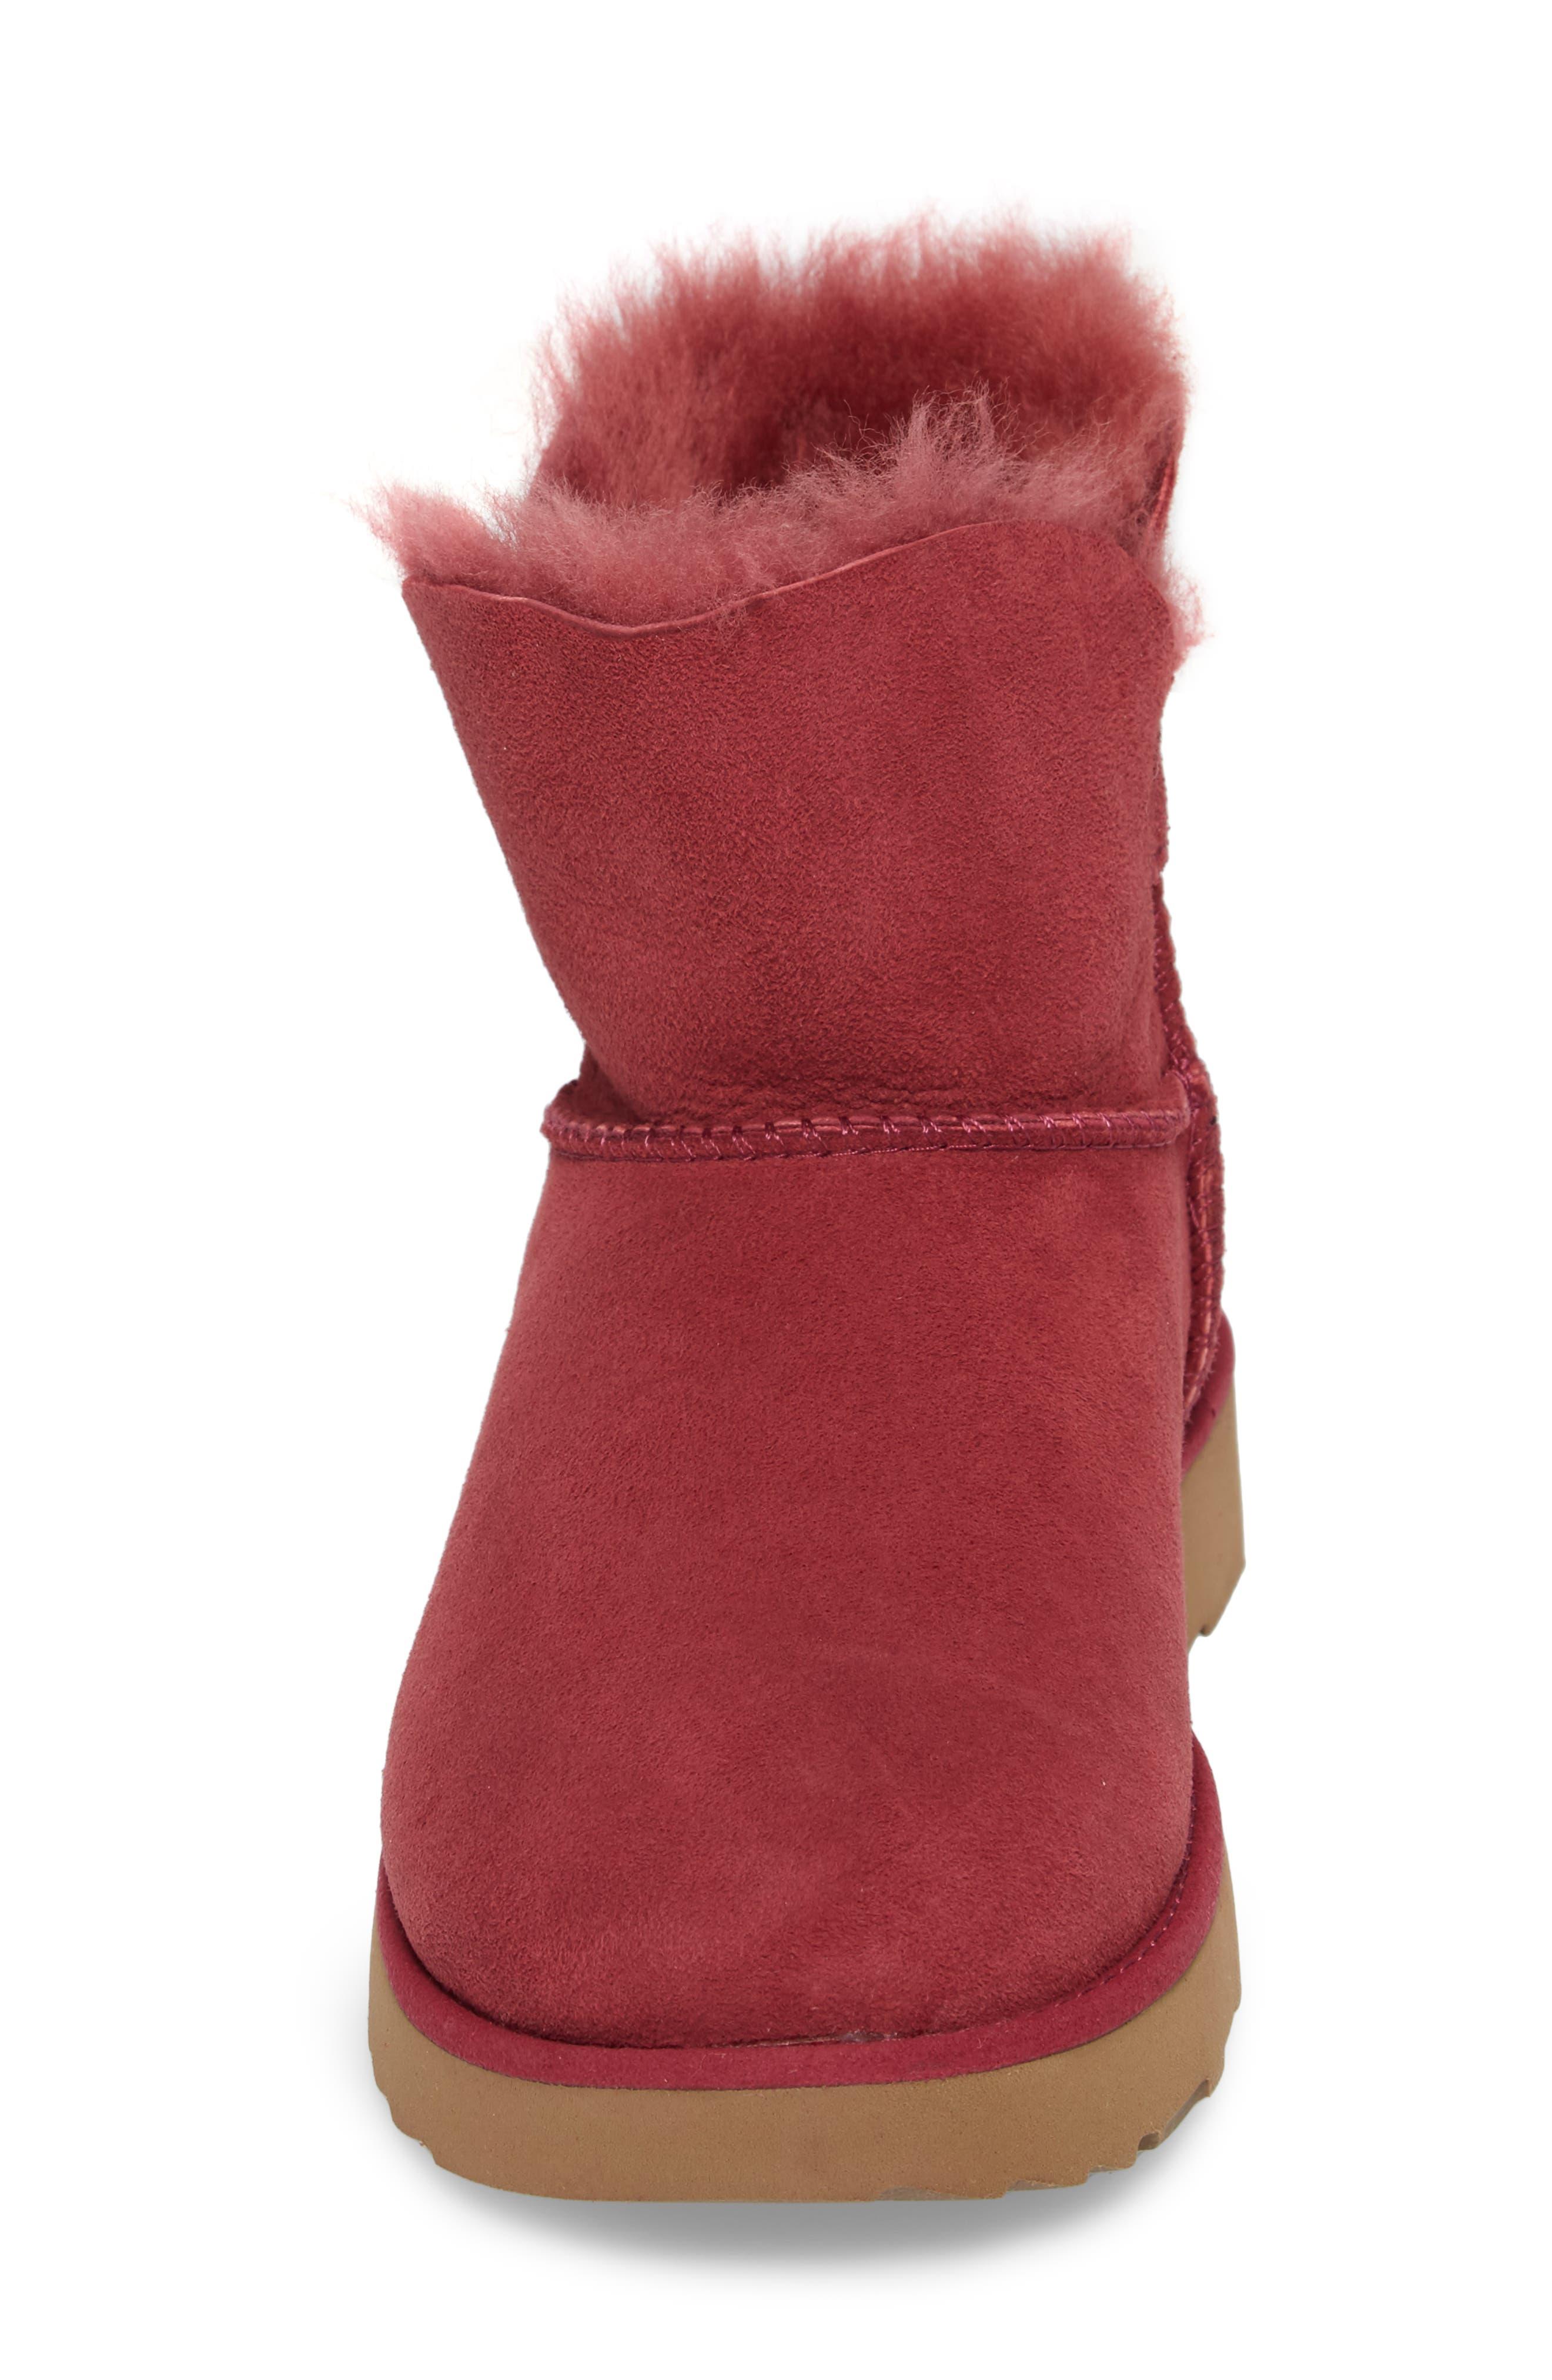 Classic Cuff Mini Boot,                             Alternate thumbnail 4, color,                             Garnet Suede